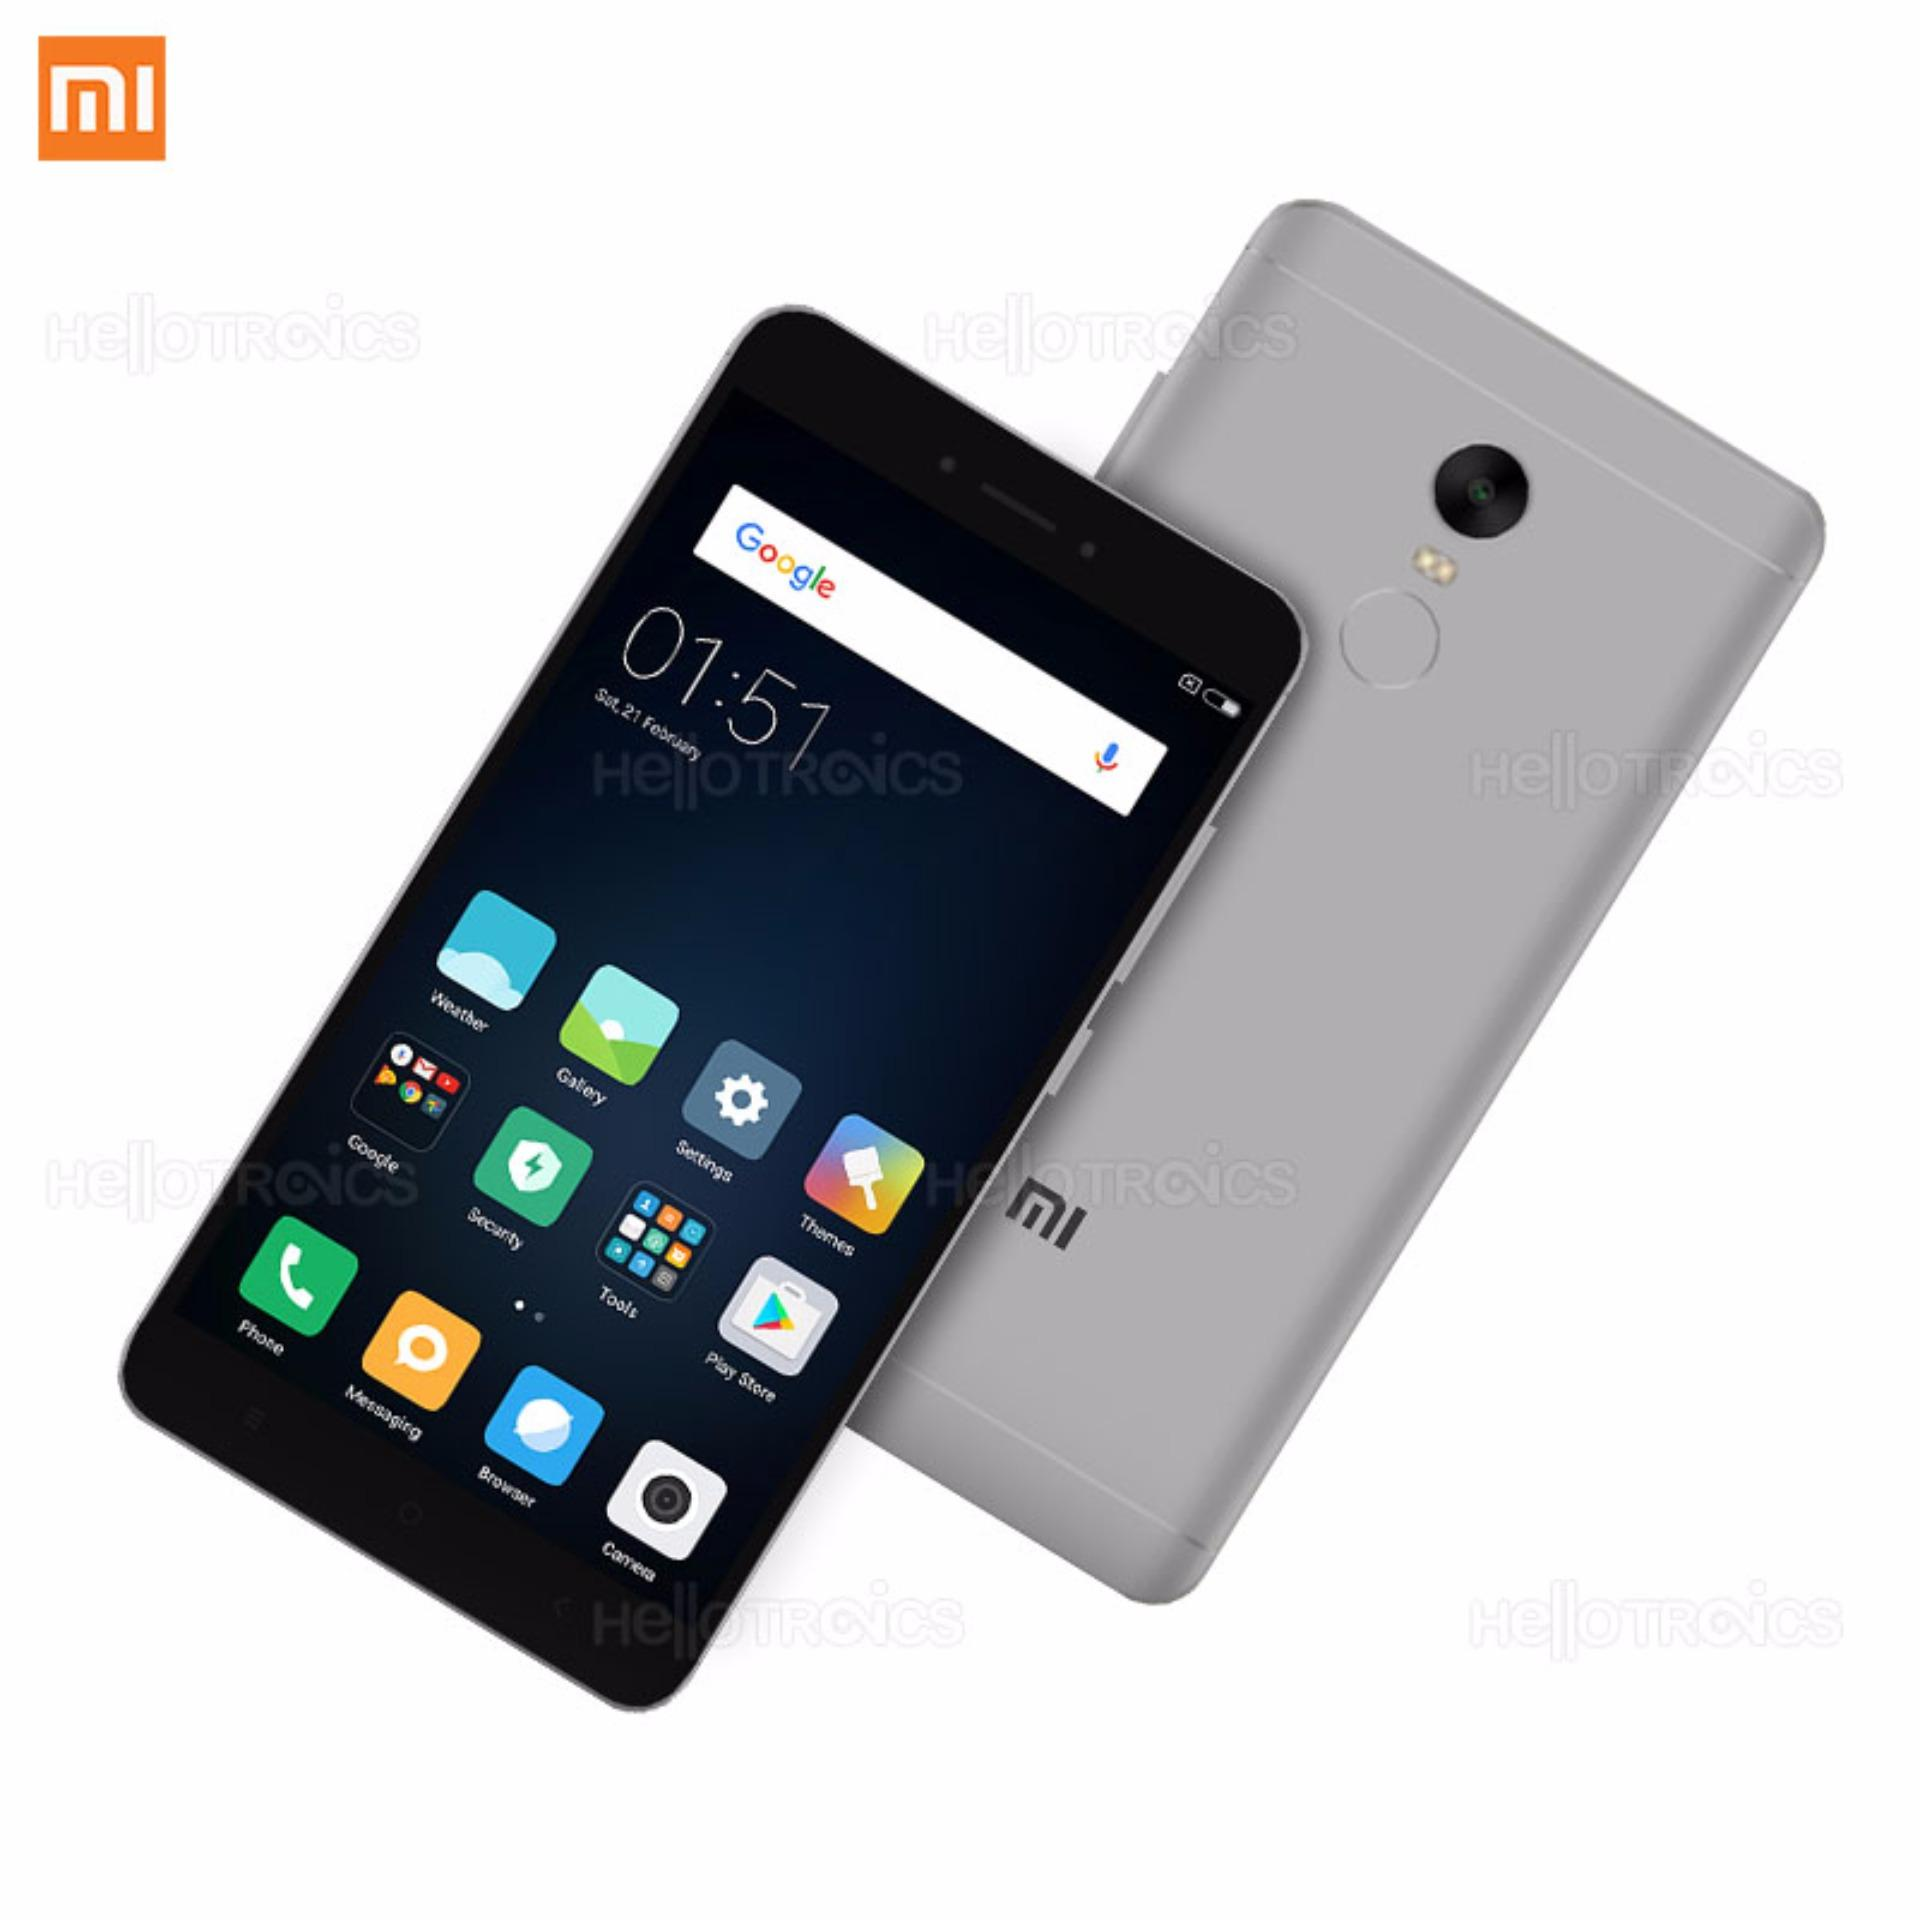 Philippines Xiaomi Redmi Note 4x 3gb Ram 16gb Rom Grey Hot Deals 3 2 16 Gb